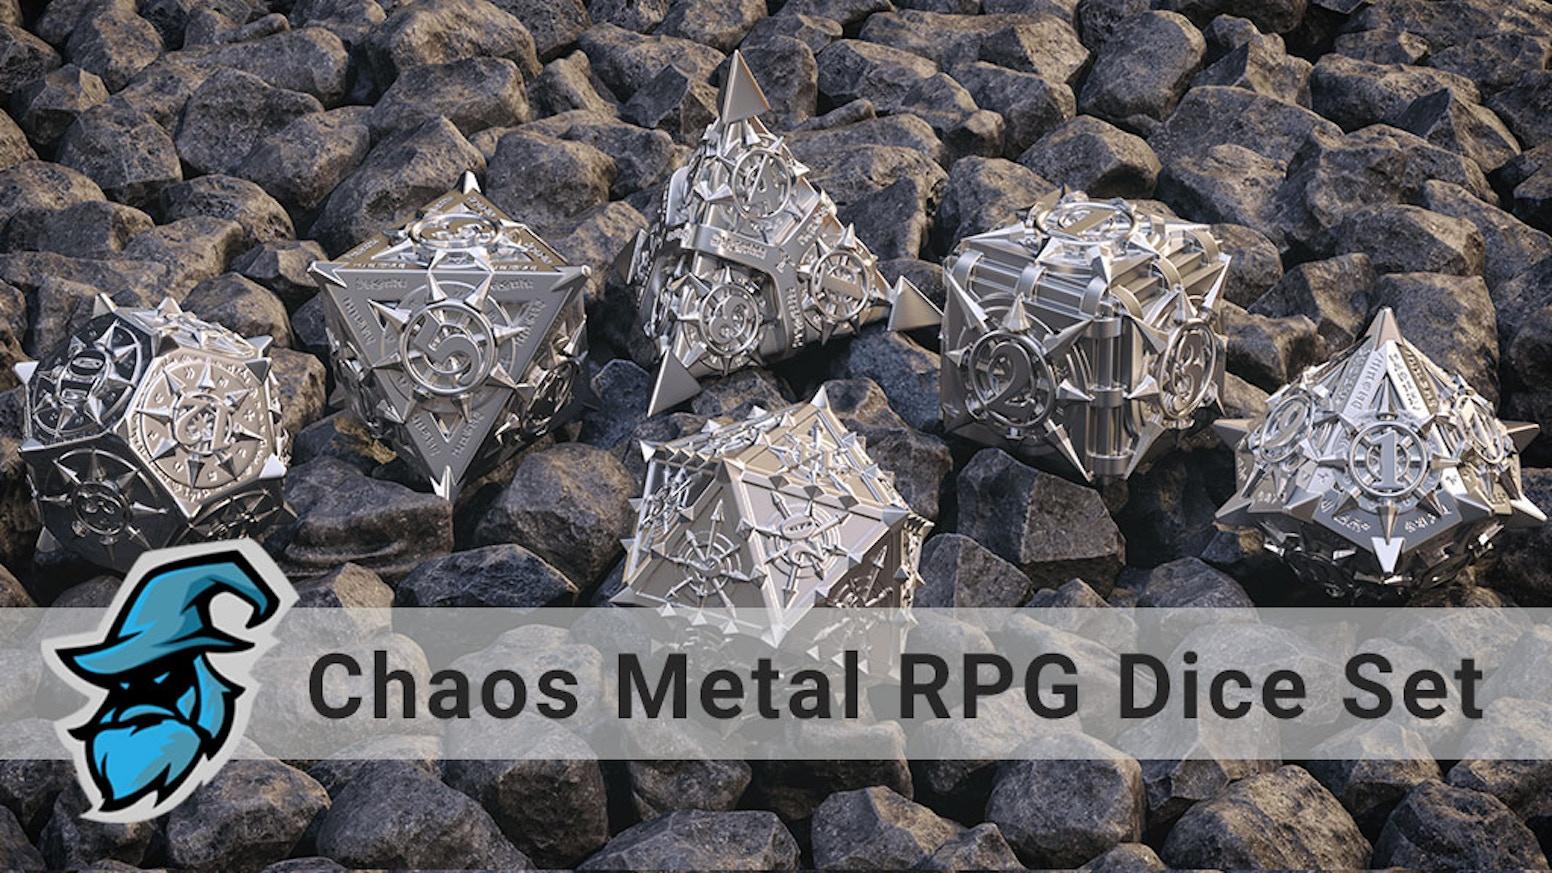 Path of Chaos Metal RPG Dice Set  - D4, D6, D8, (2x) D10, D12, D20